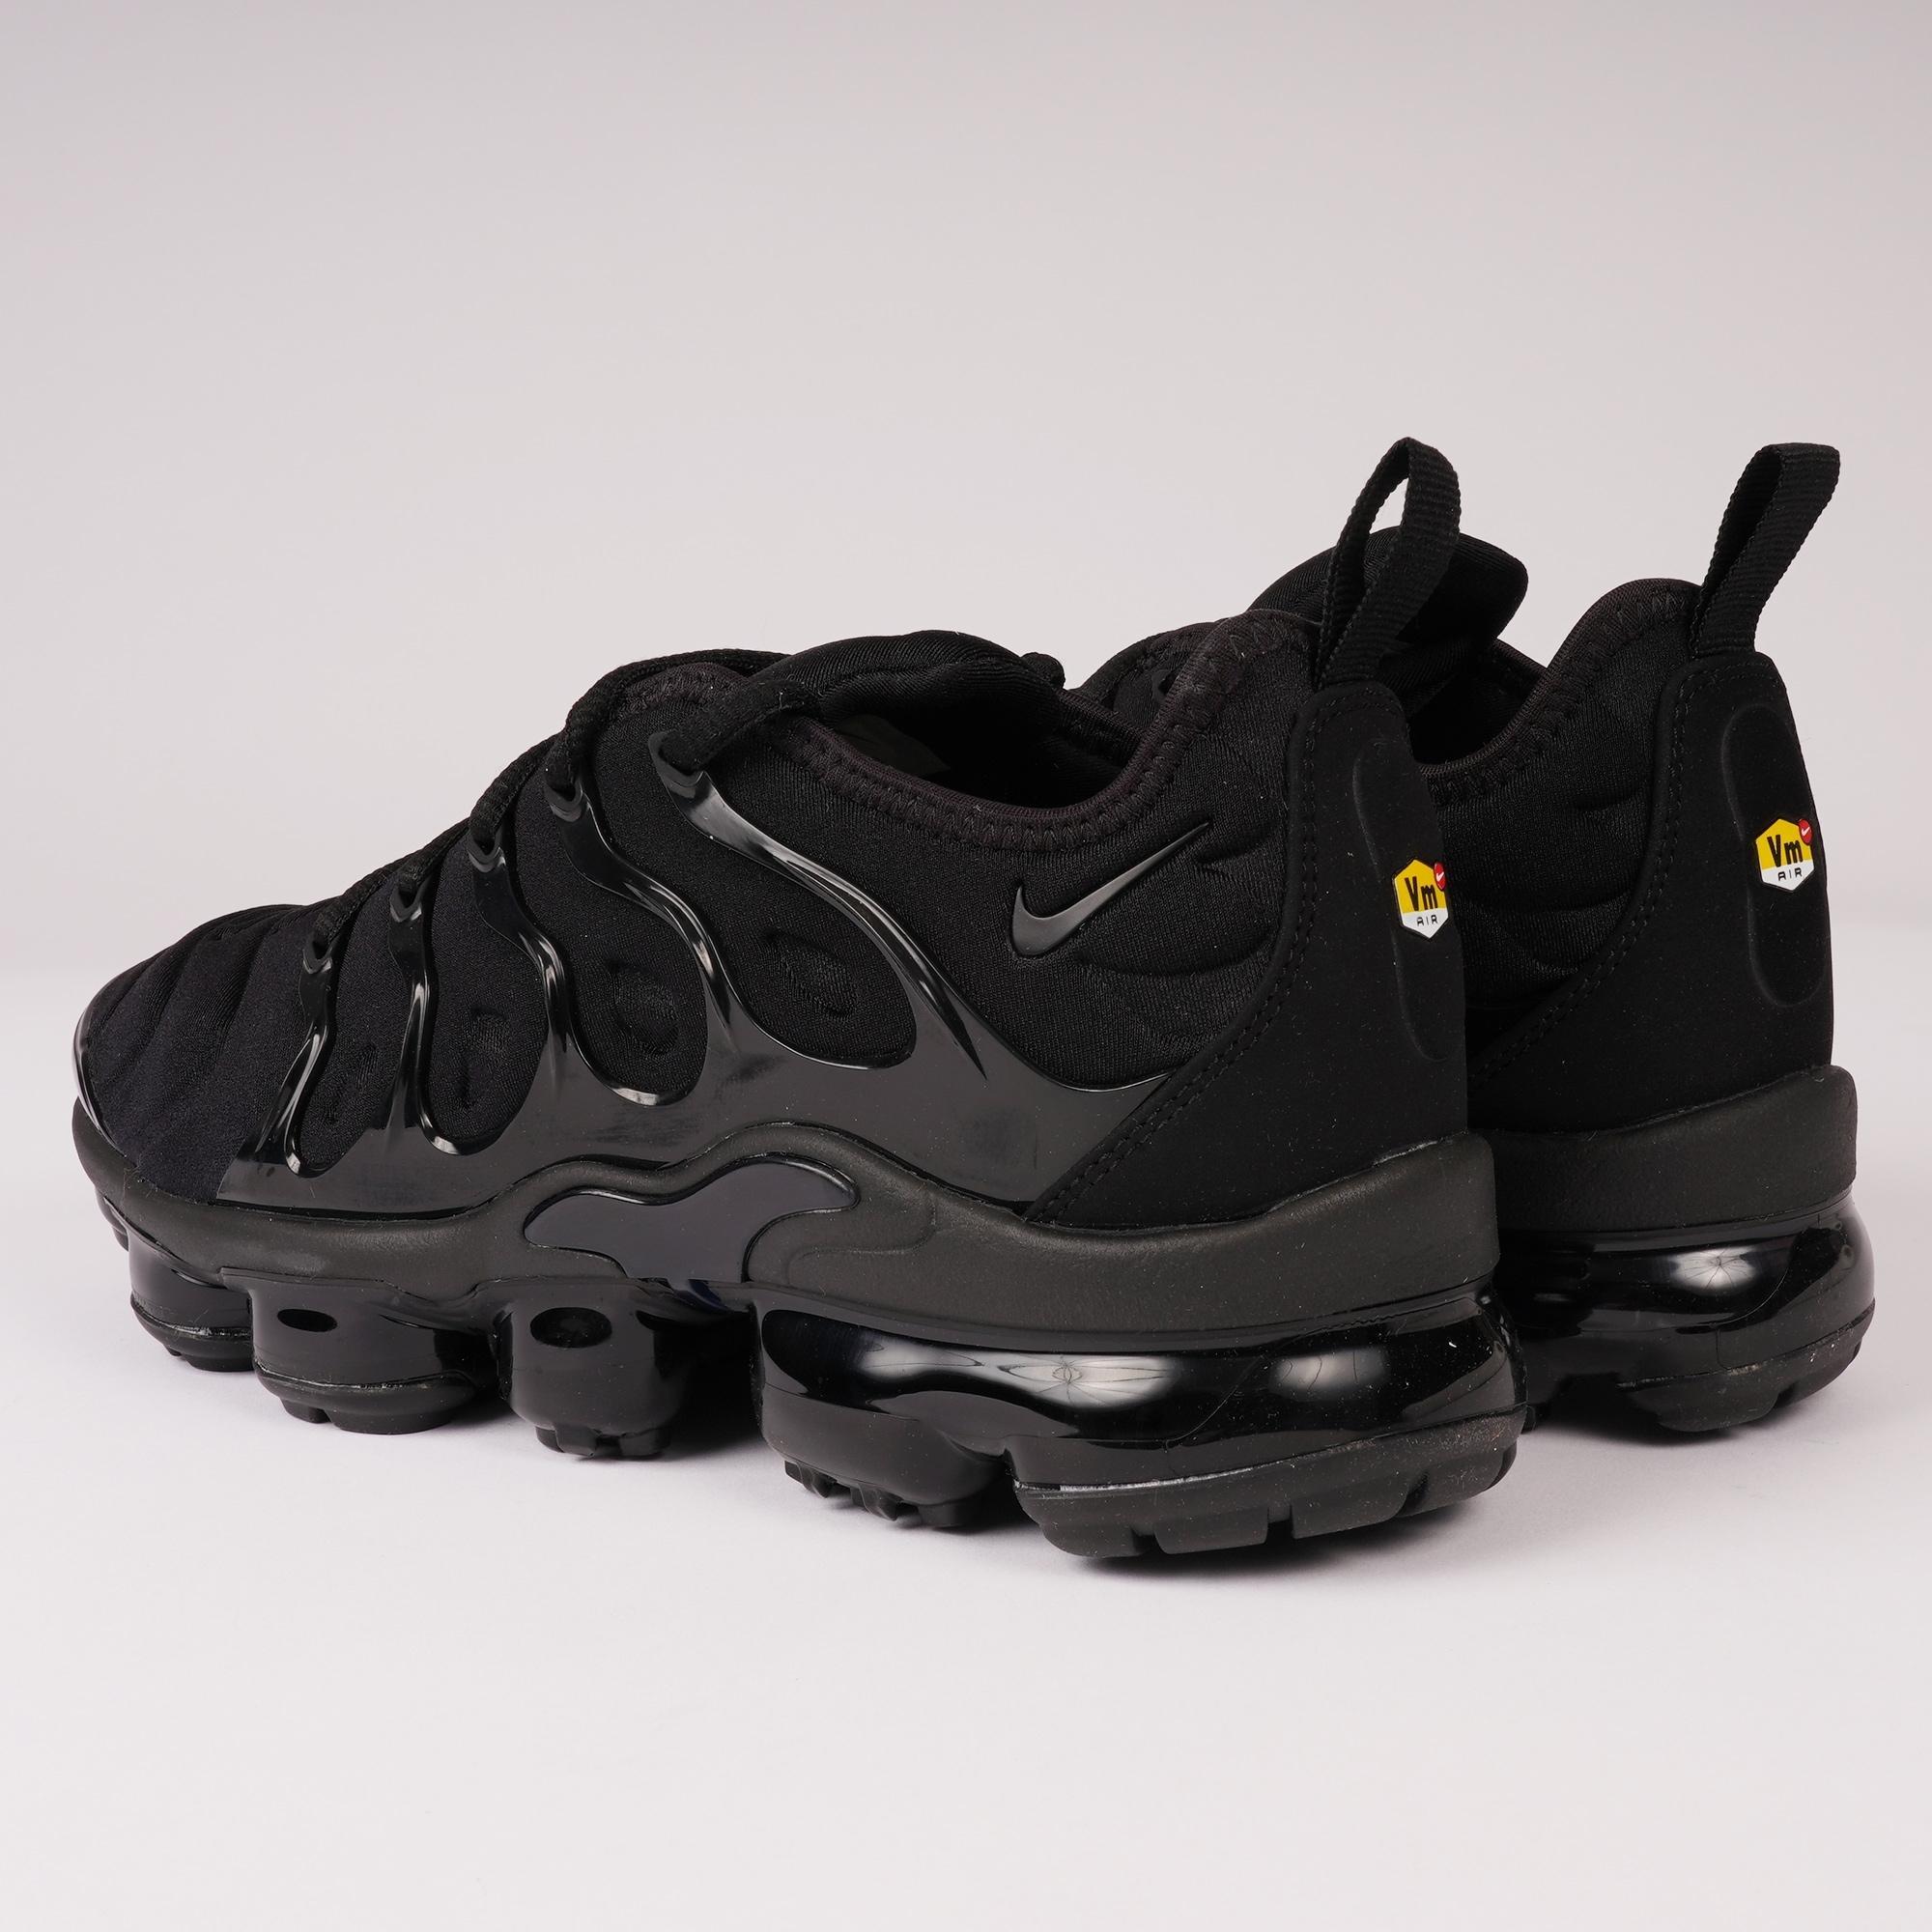 fb57ffaa3113 Nike - Black Vapormax Plus for Men - Lyst. View fullscreen